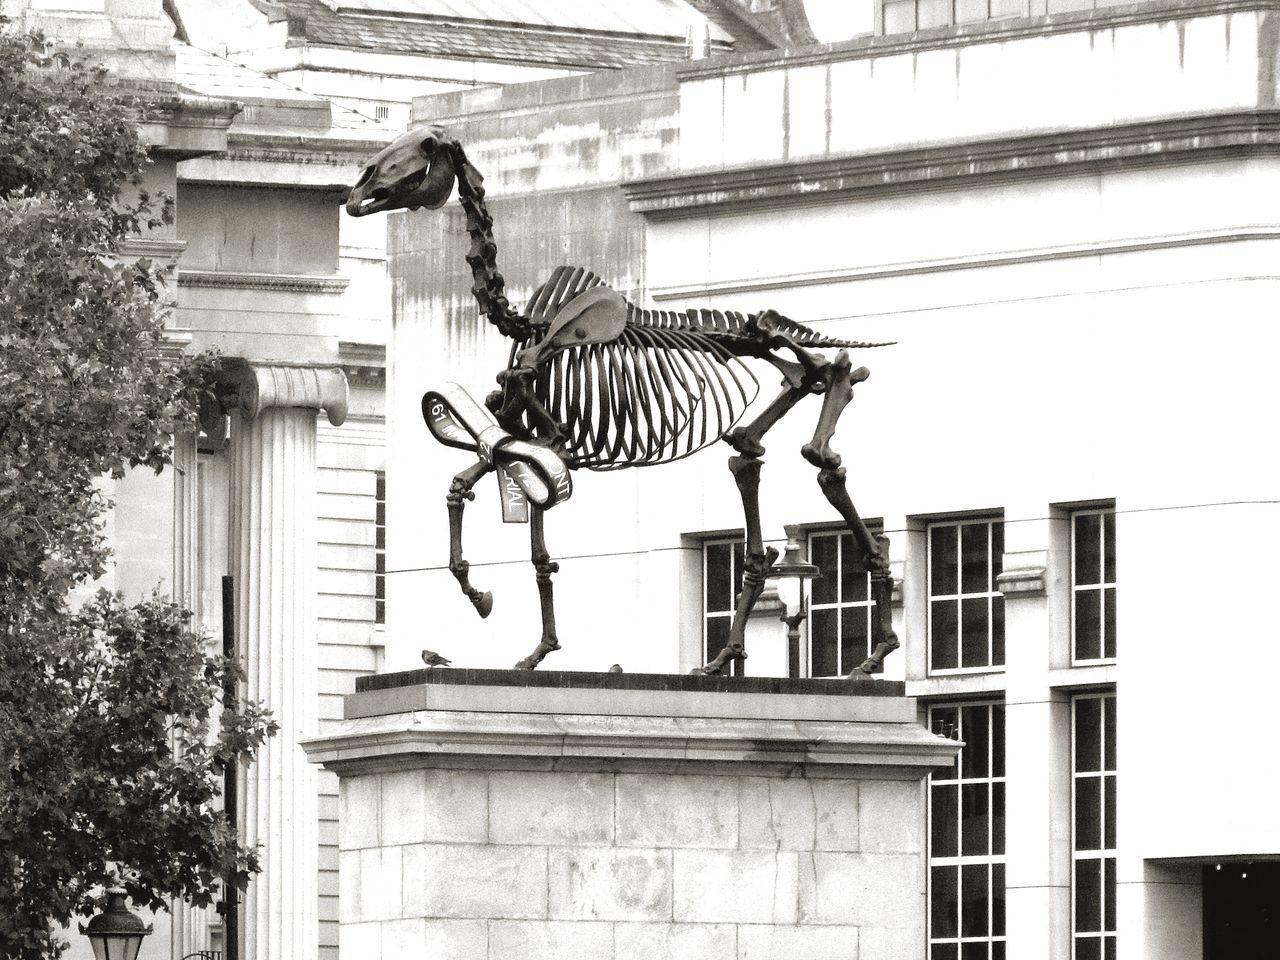 Dinosaur Skeleton Sculpture Westminster London Rainy Day Black & White Outdoors Day EyeEmNewHere